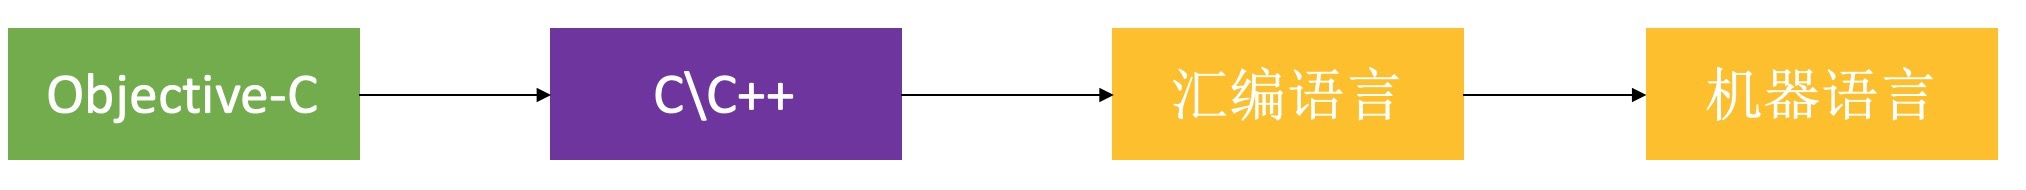 Objective-C执行过程